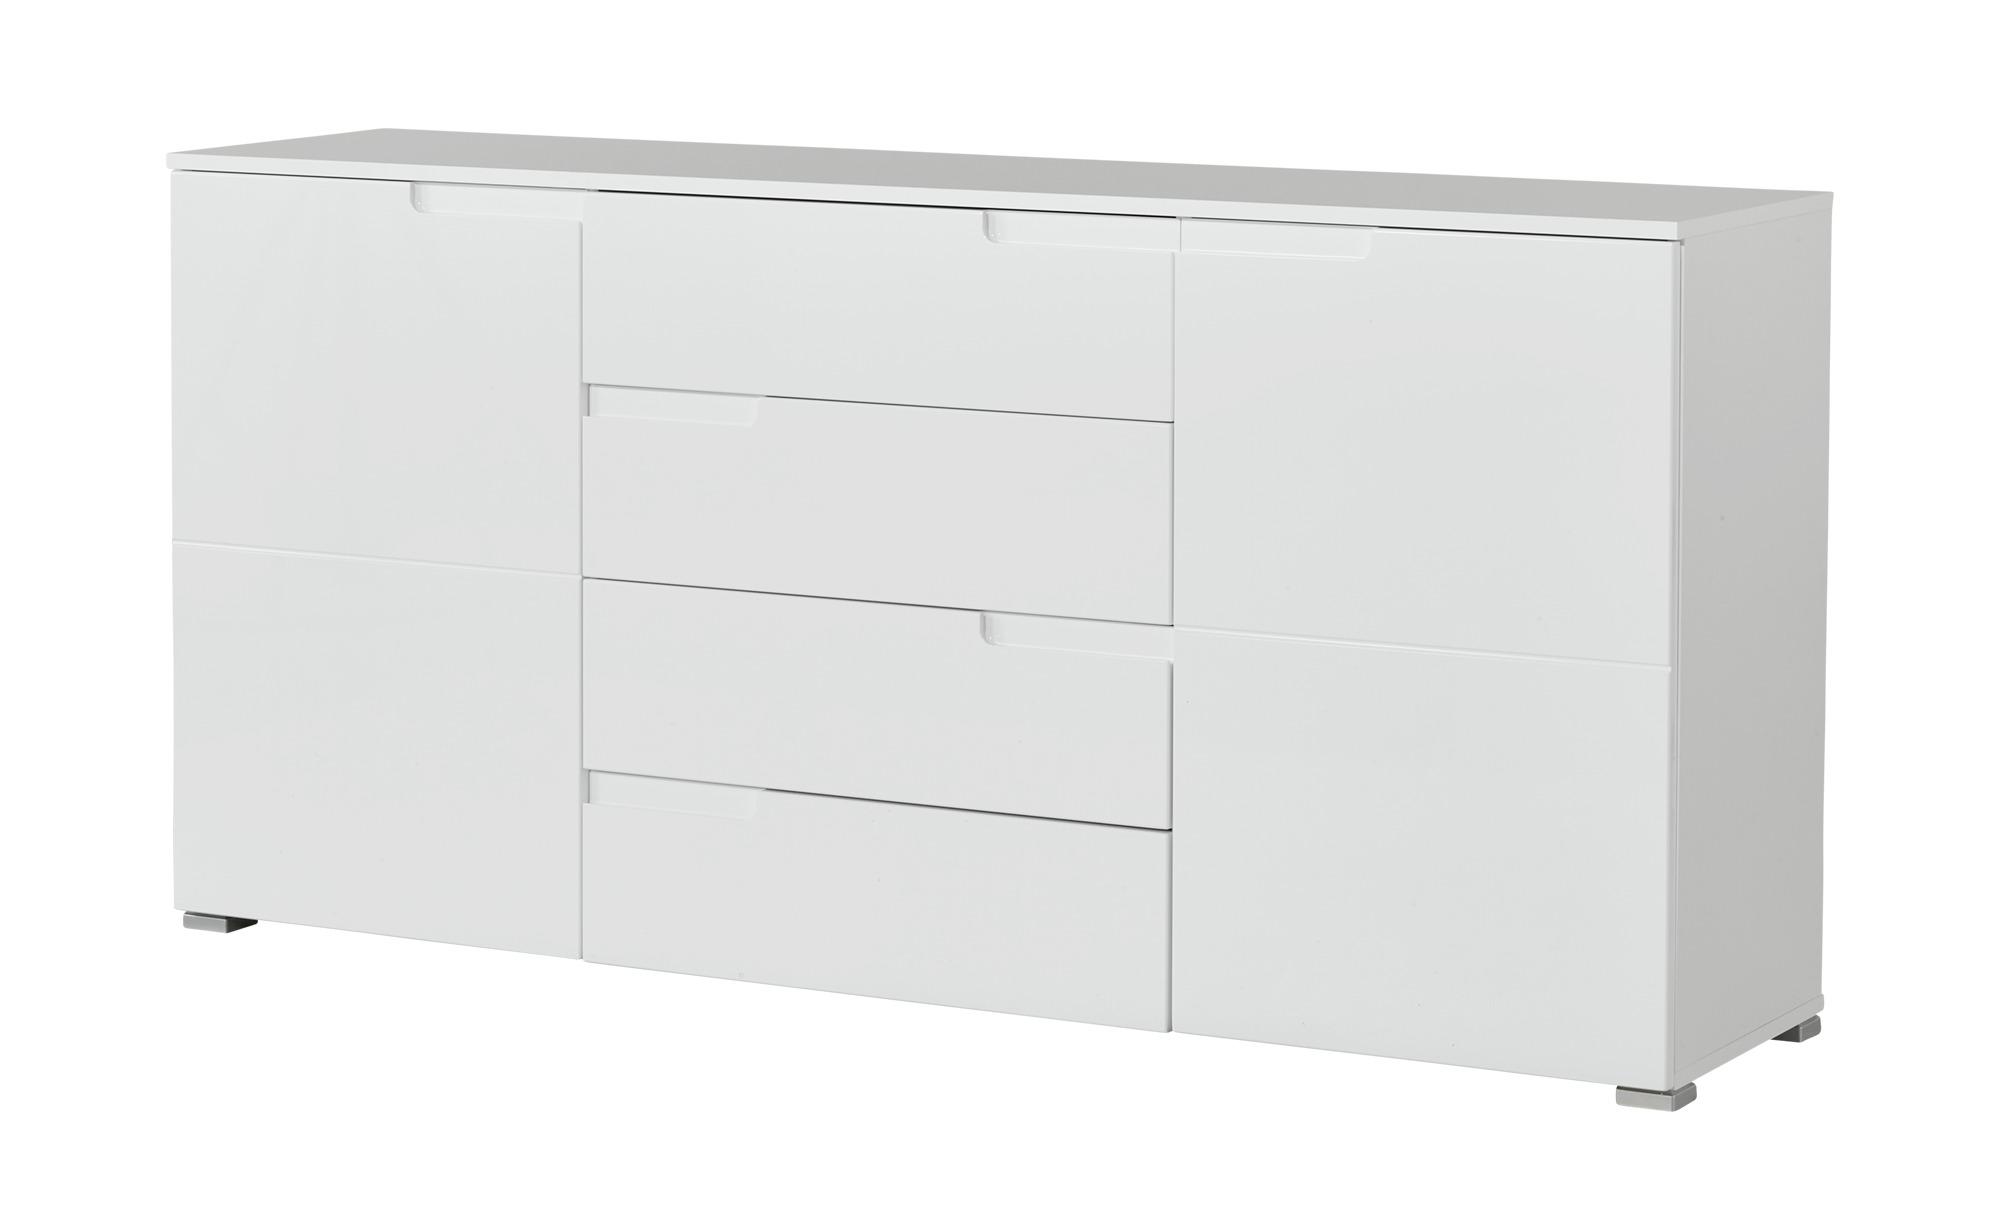 Sideboard  Palermo ¦ weiß ¦ Maße (cm): B: 165 H: 80 T: 40 Kommoden & Sideboards > Kommoden - Höffner